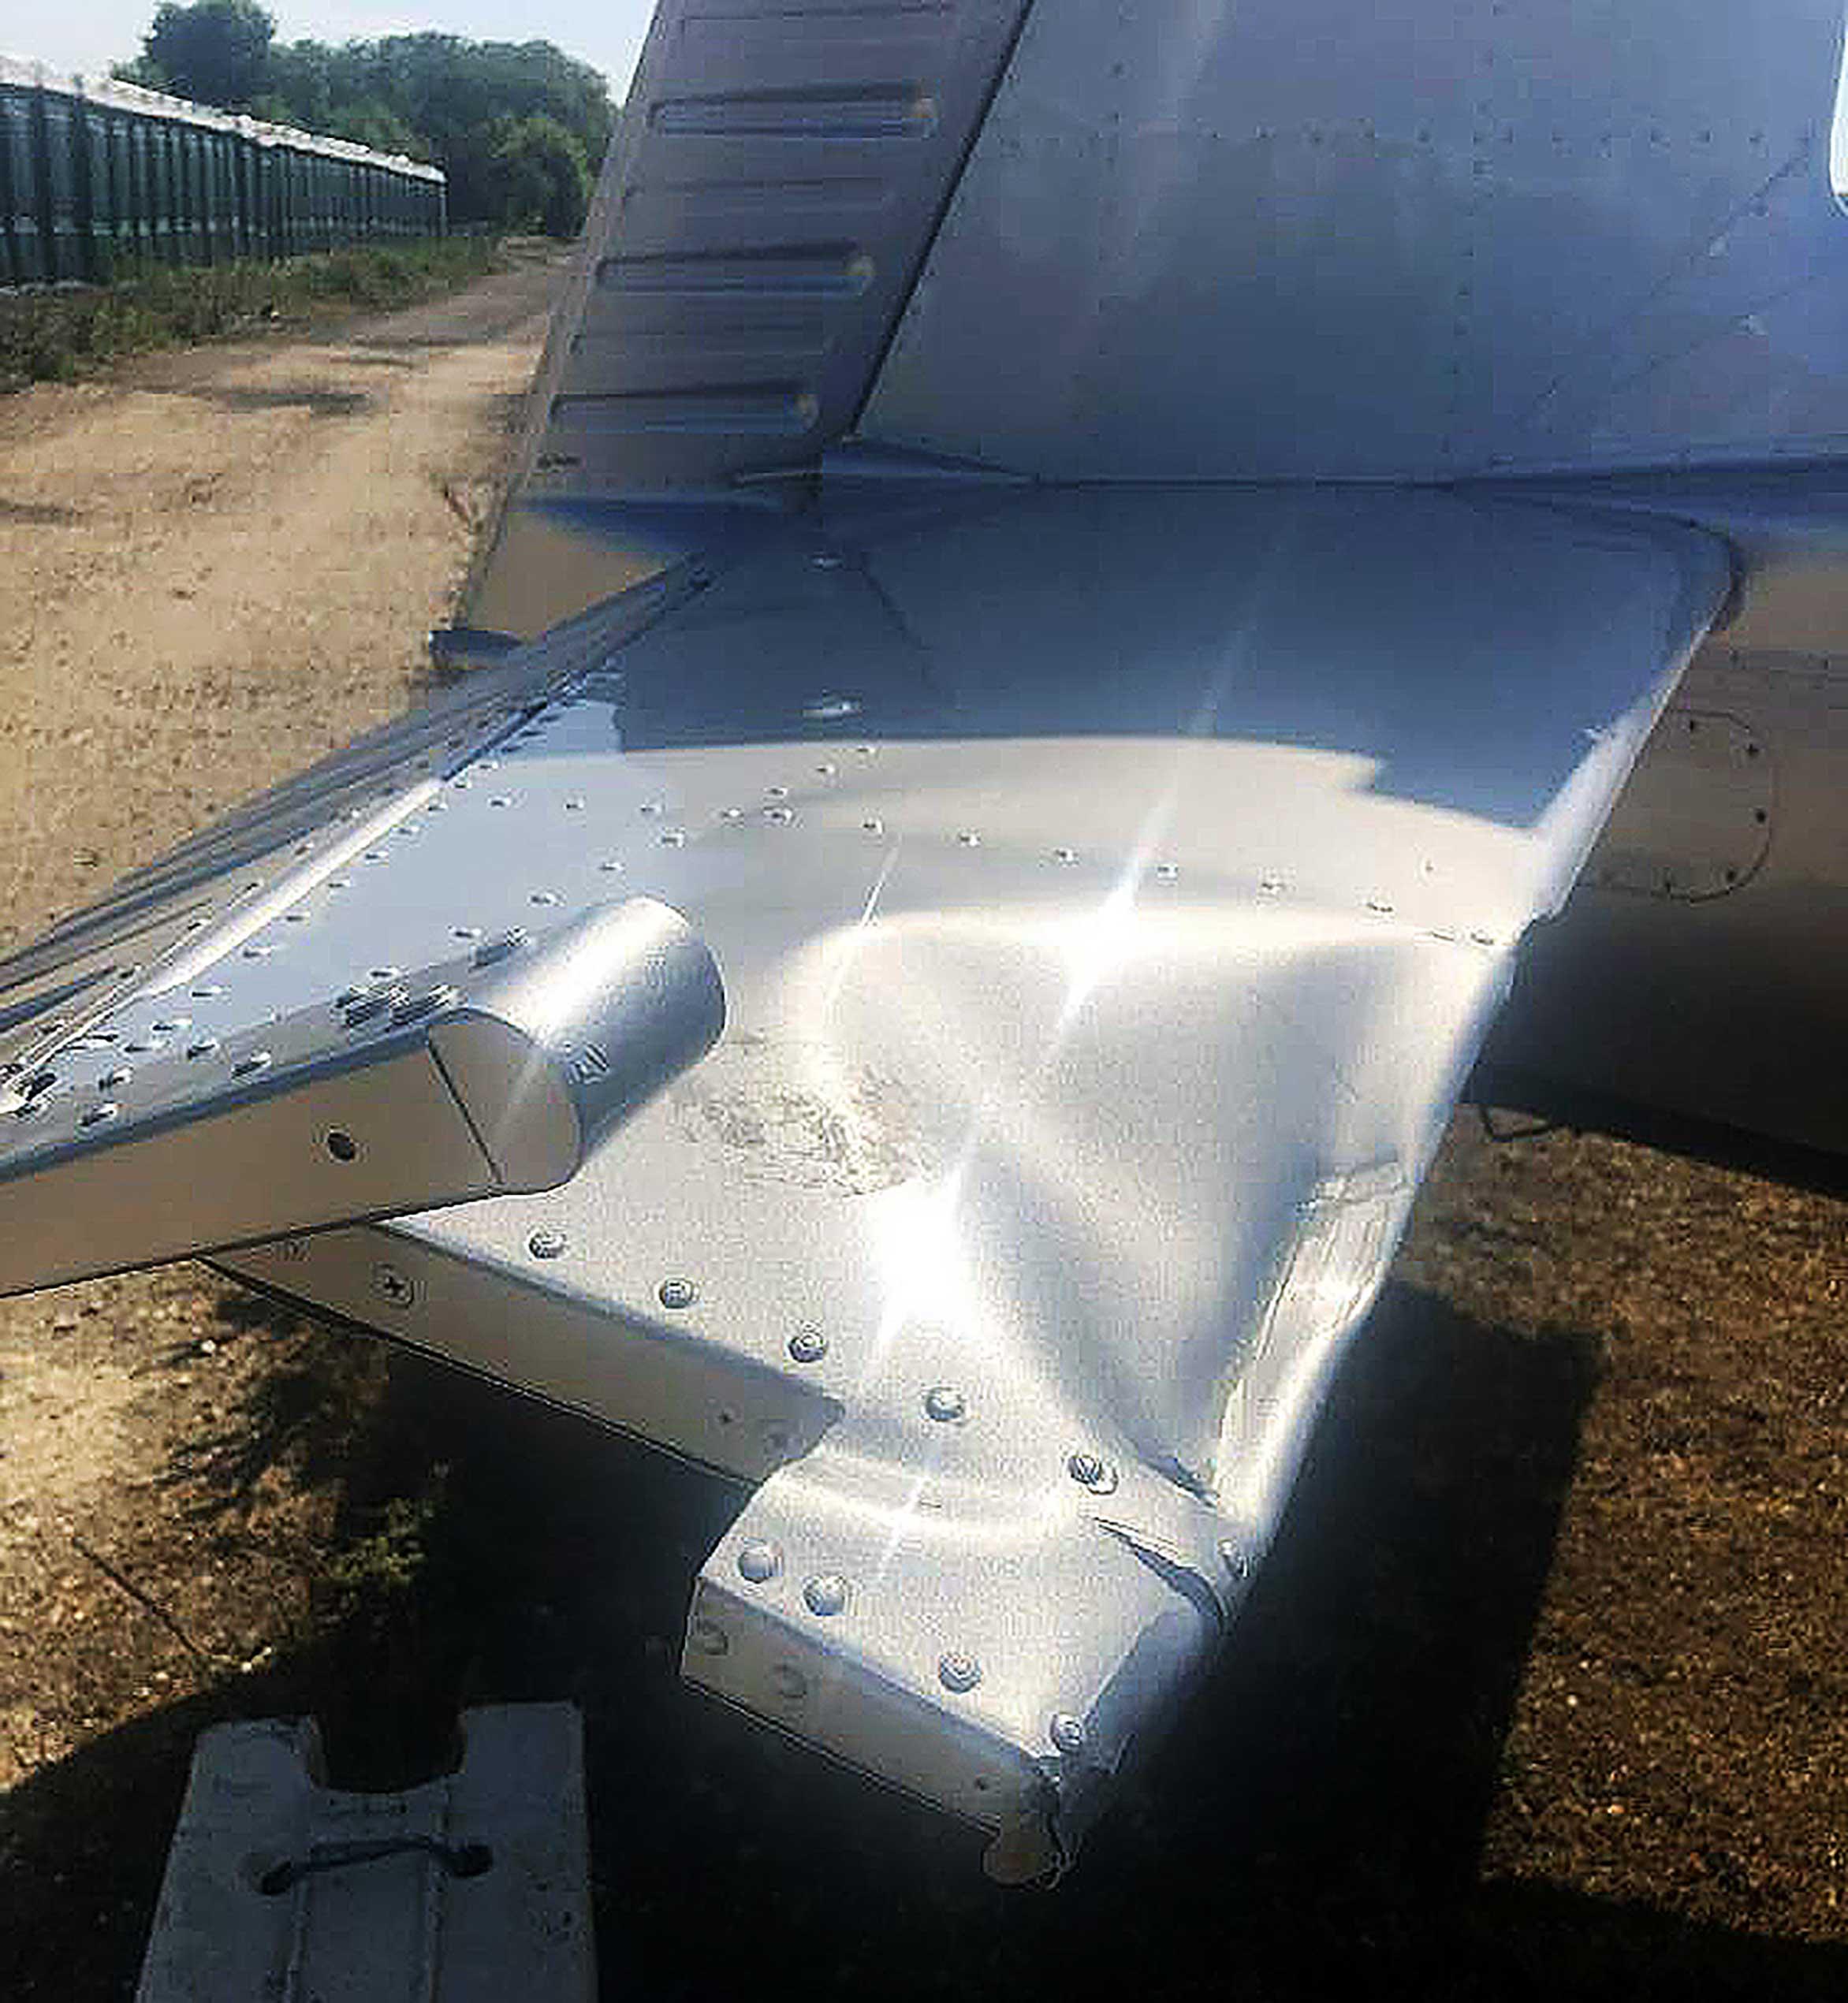 Mooney bucked tailplane